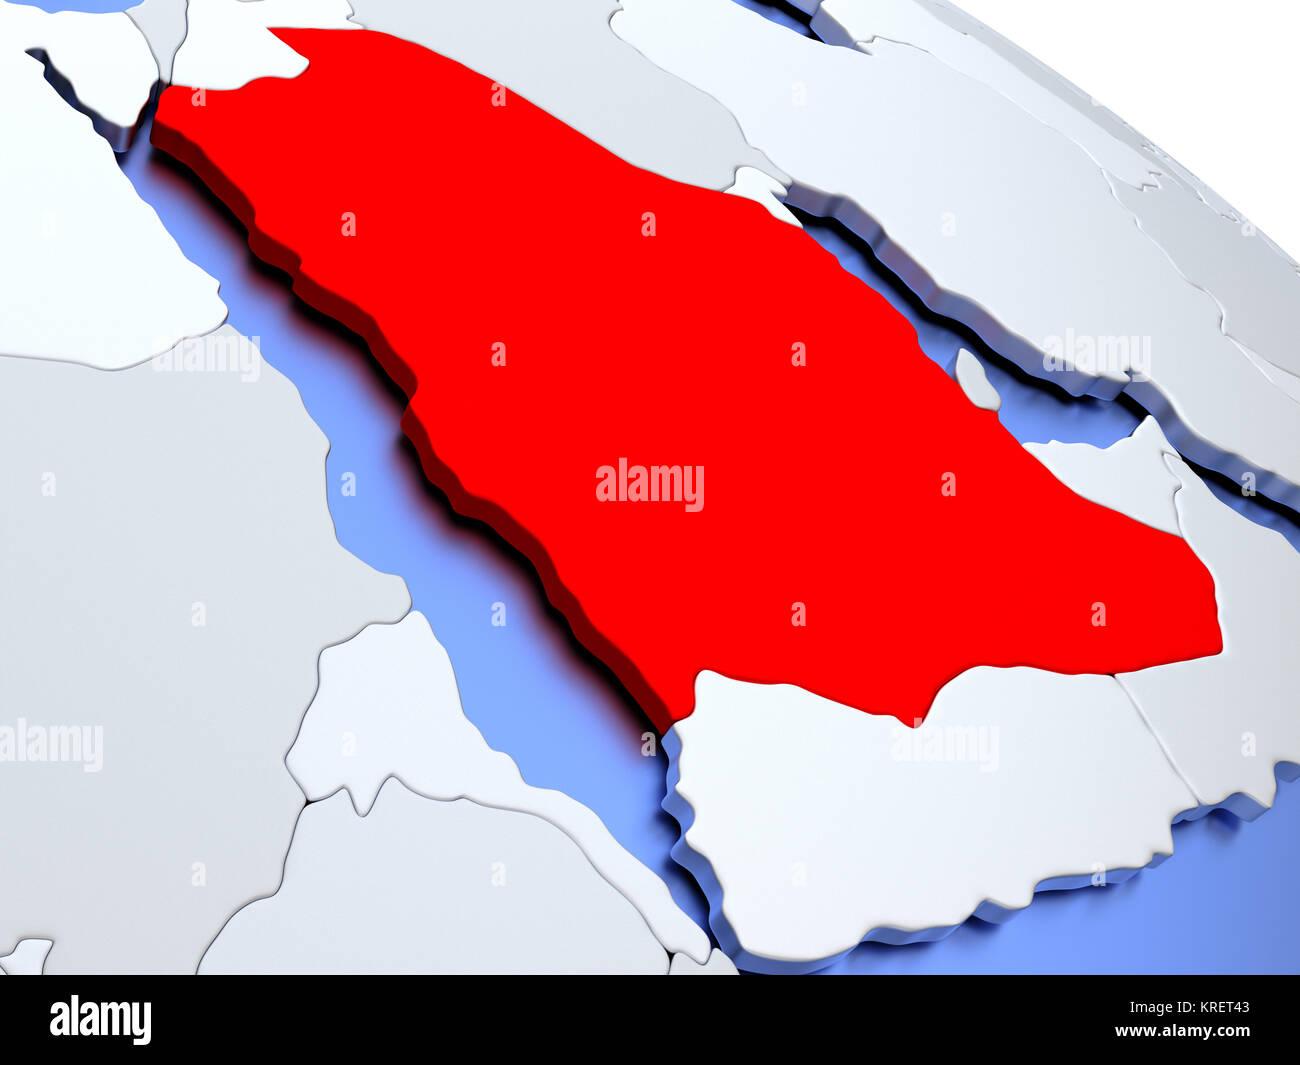 Saudi Arabia on world map Stock Photo: 169356659 - Alamy